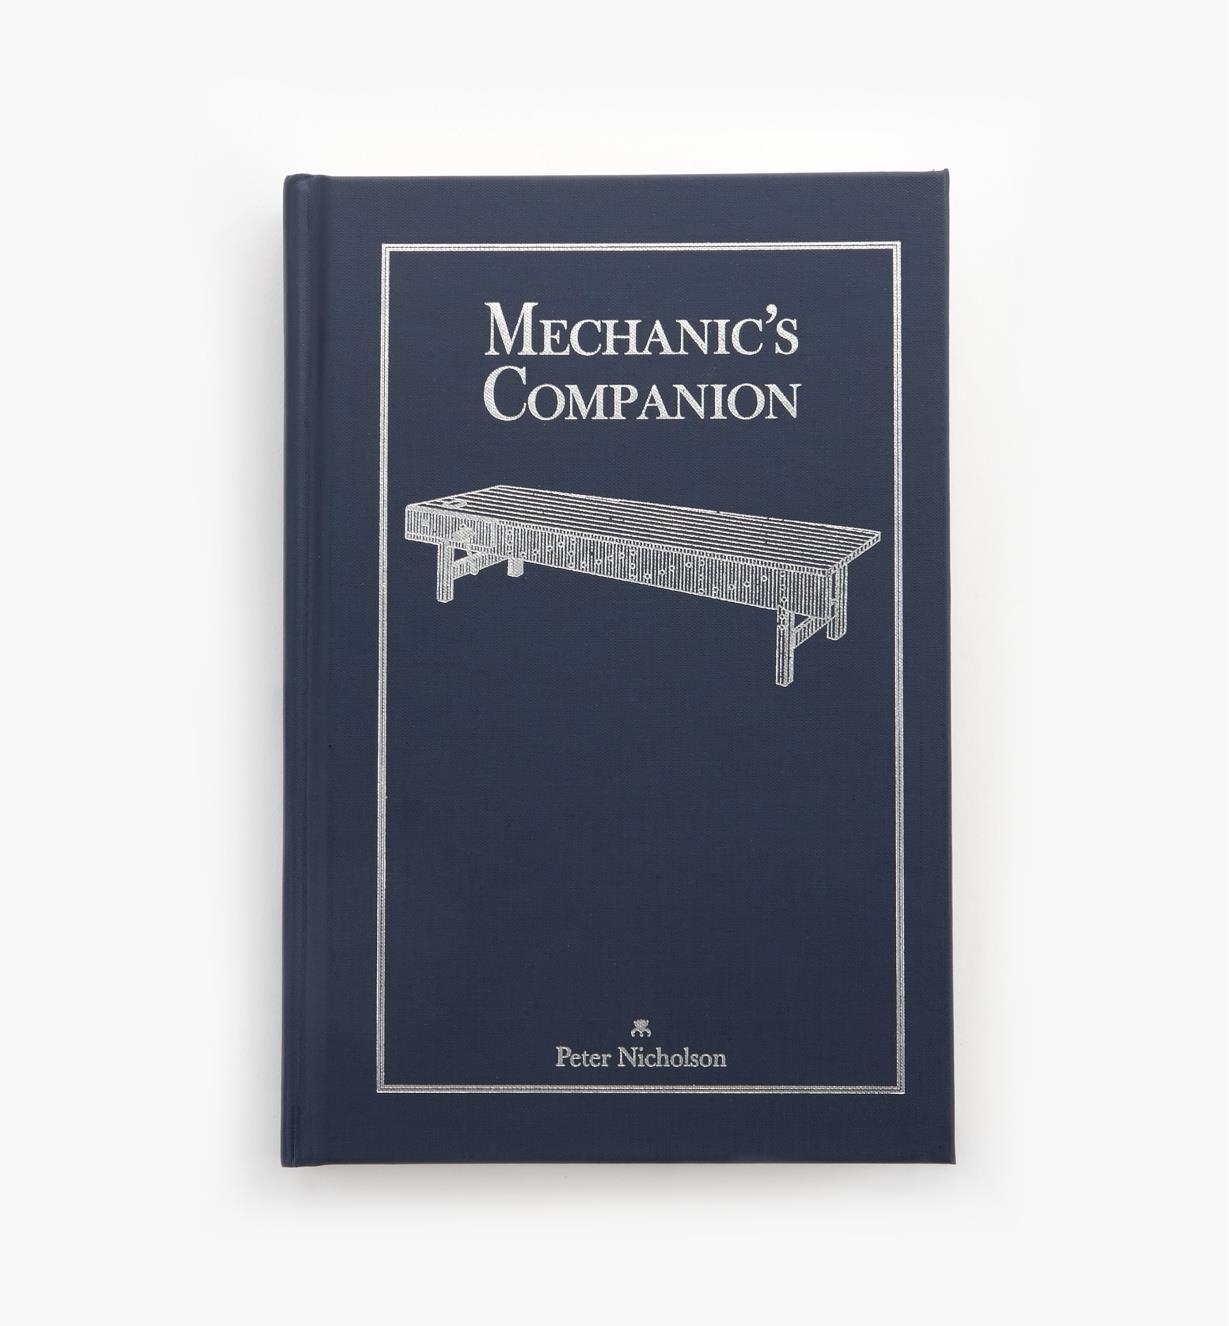 26L0235 - The Mechanic's Companion